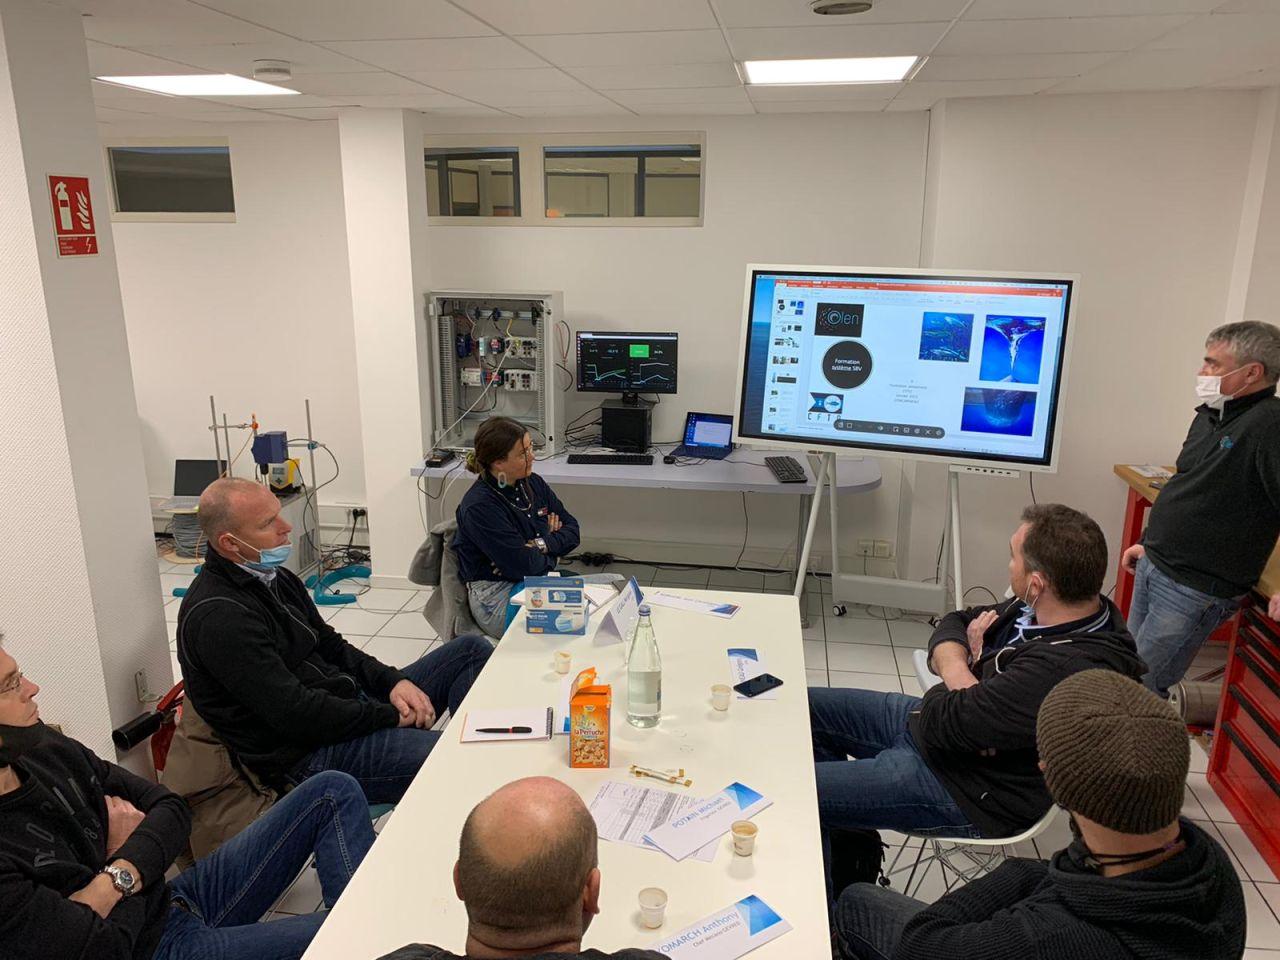 SBV Training - Smart Brine Viewer Training